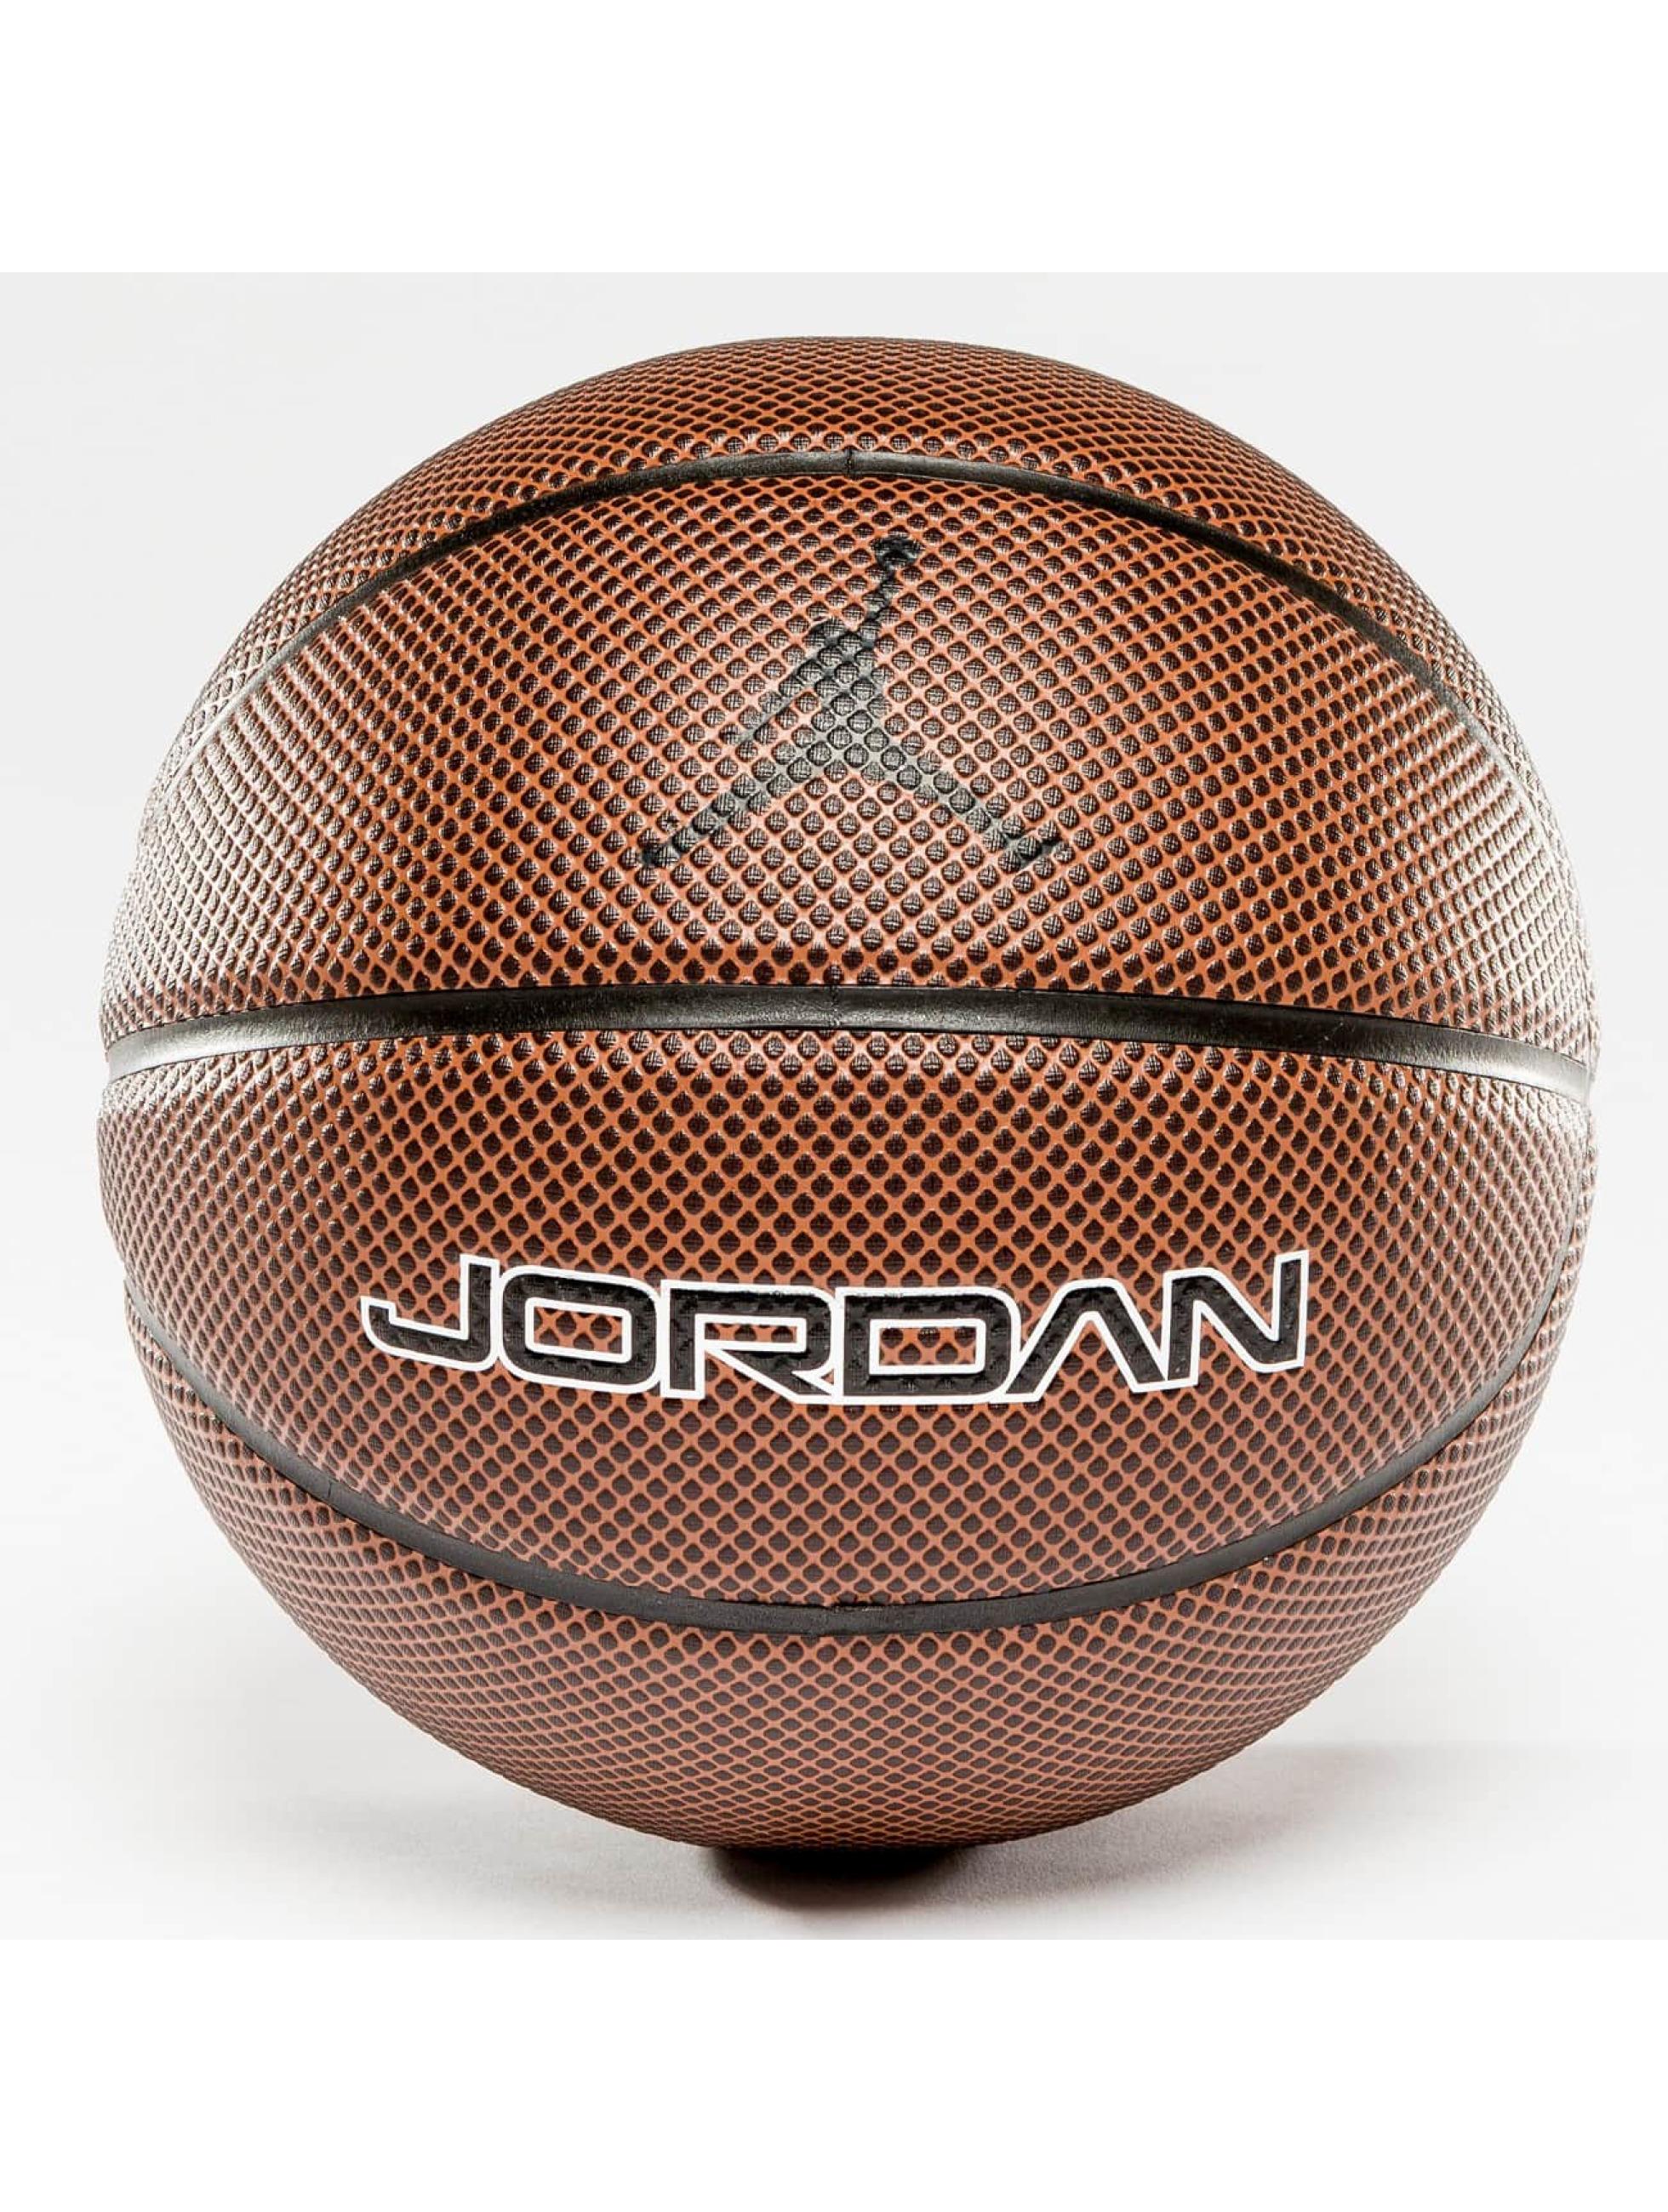 Jordan Männer,Frauen,Kinder Ball Legacy 8P in orange